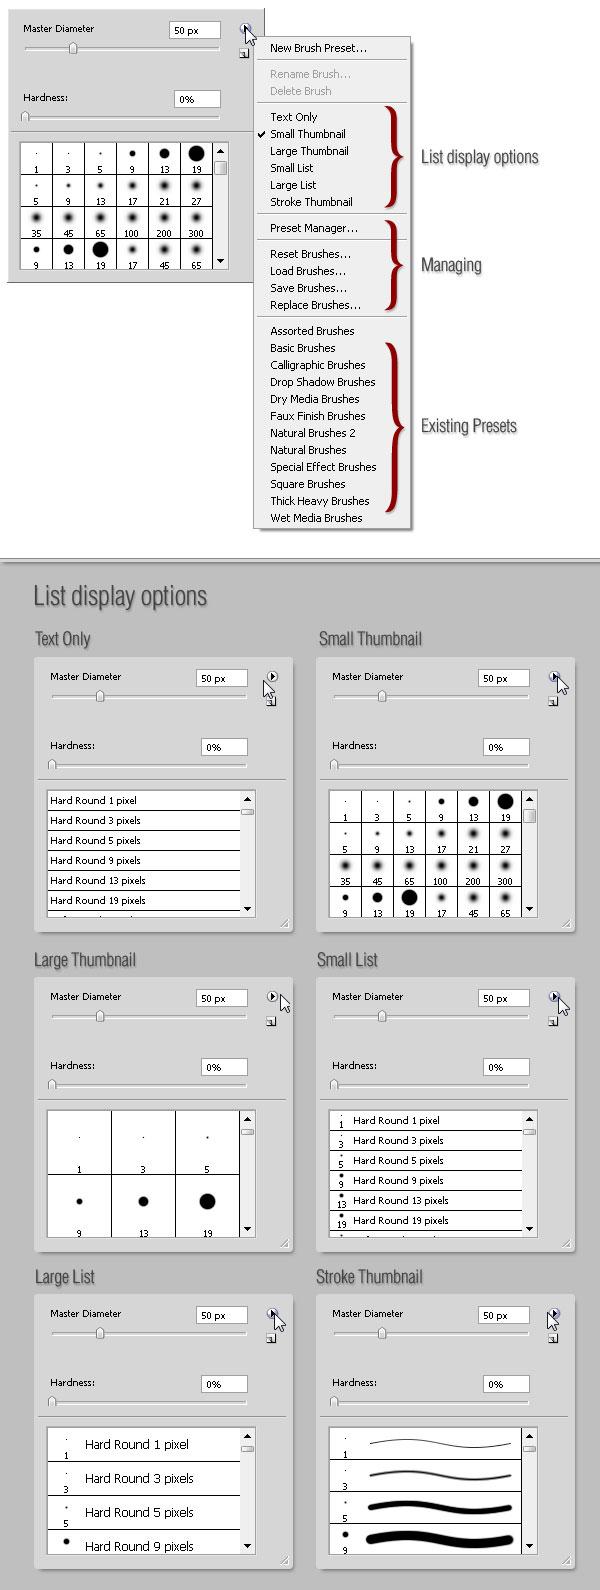 Photoshop Brush Tool: A Basic Guide